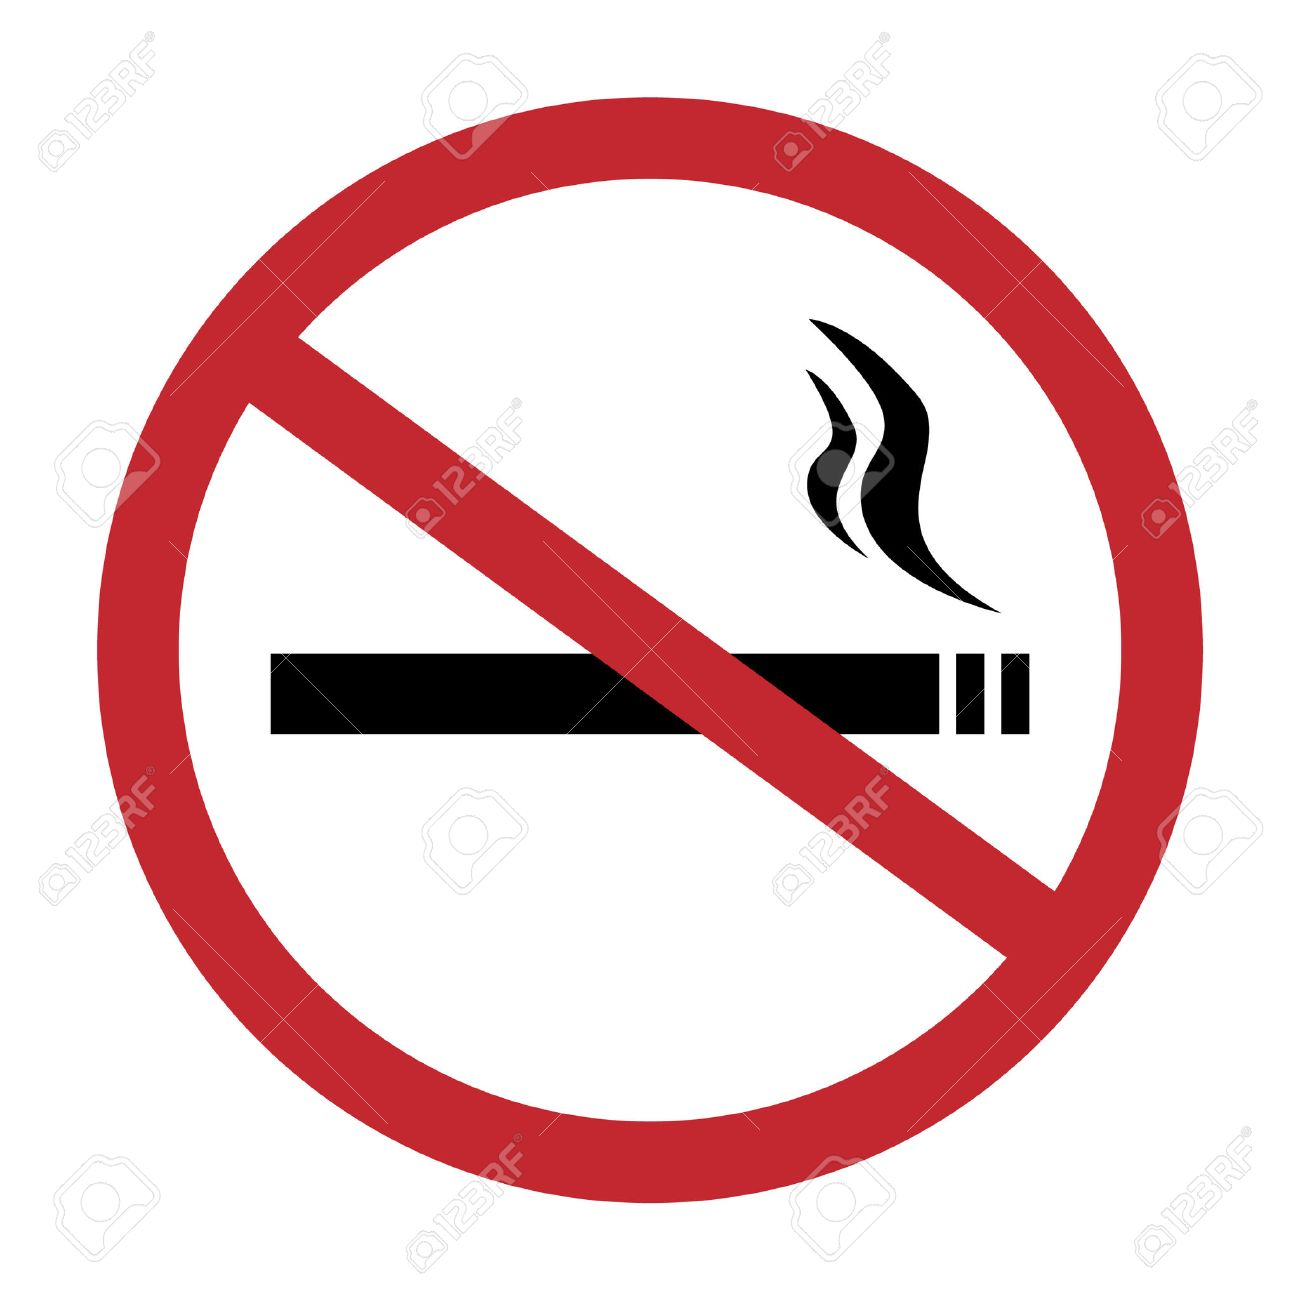 round no smoking sign quit smoking smoke free no smoking icon rh 123rf com no smoking vector free download no smoking vector free download